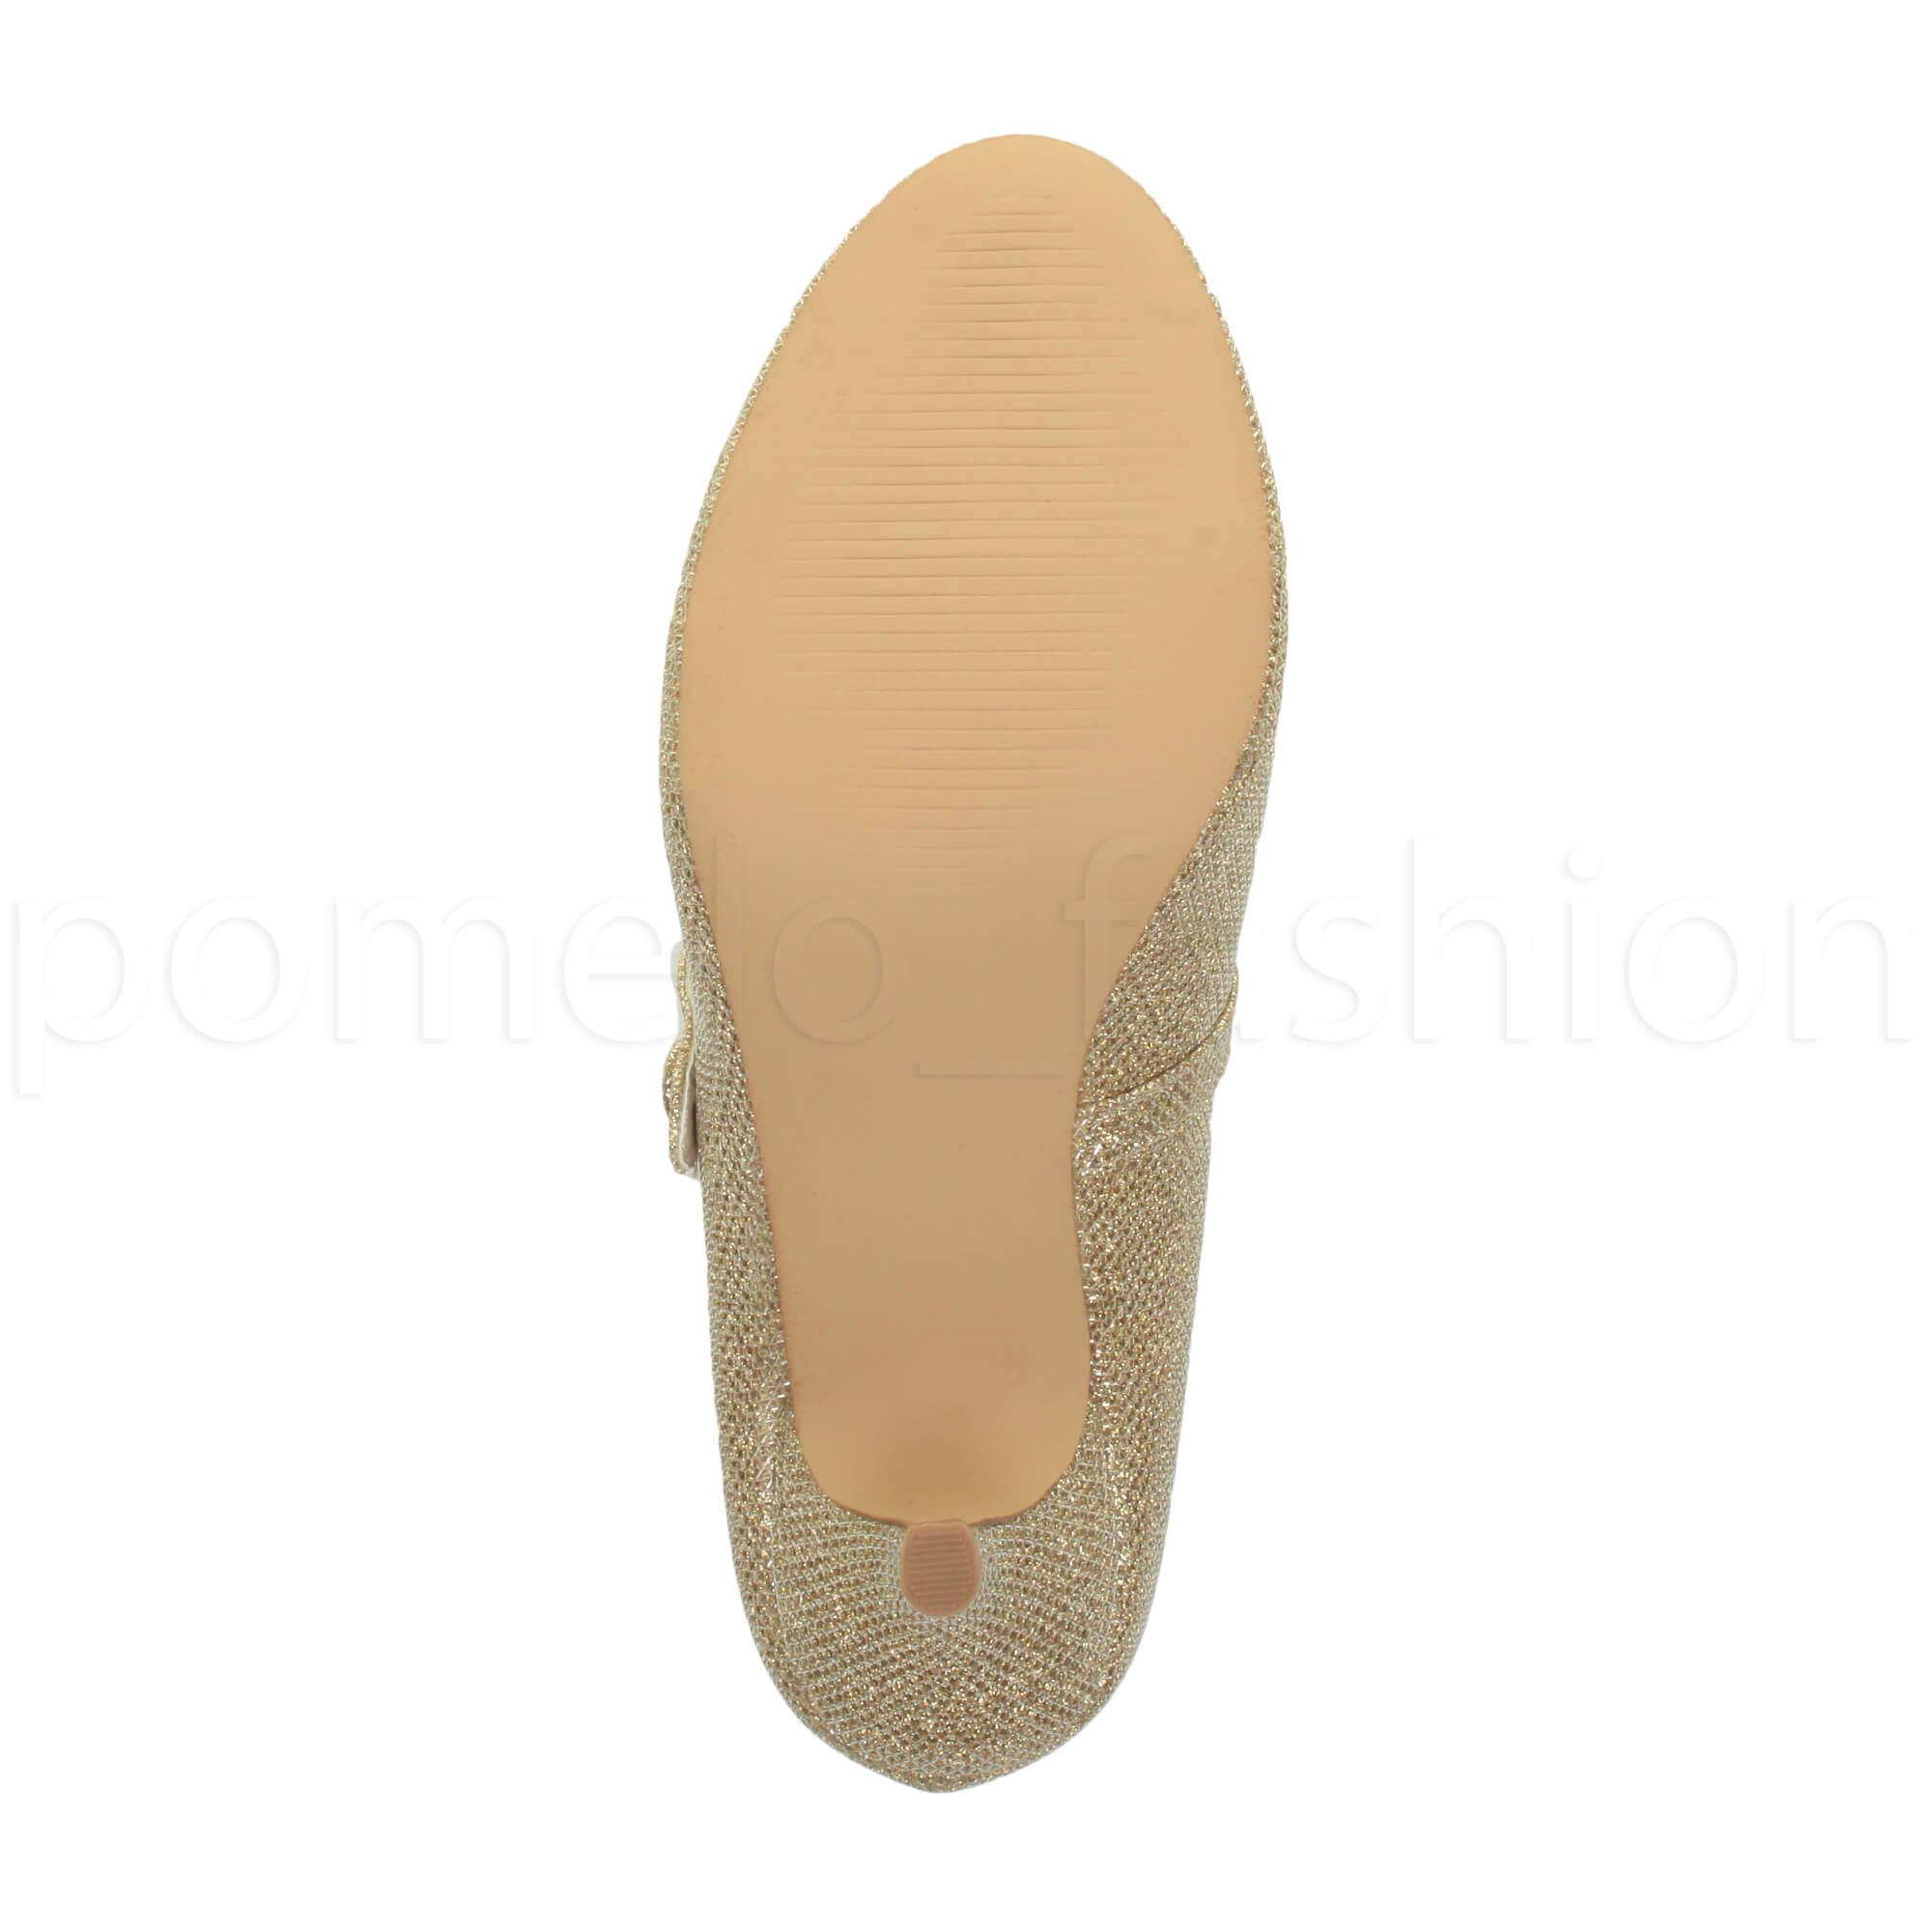 miniatura 78 - Donna basso tacco medio Mary Jane Damigella Matrimonio Pompe Scarpe Da Sera Taglia